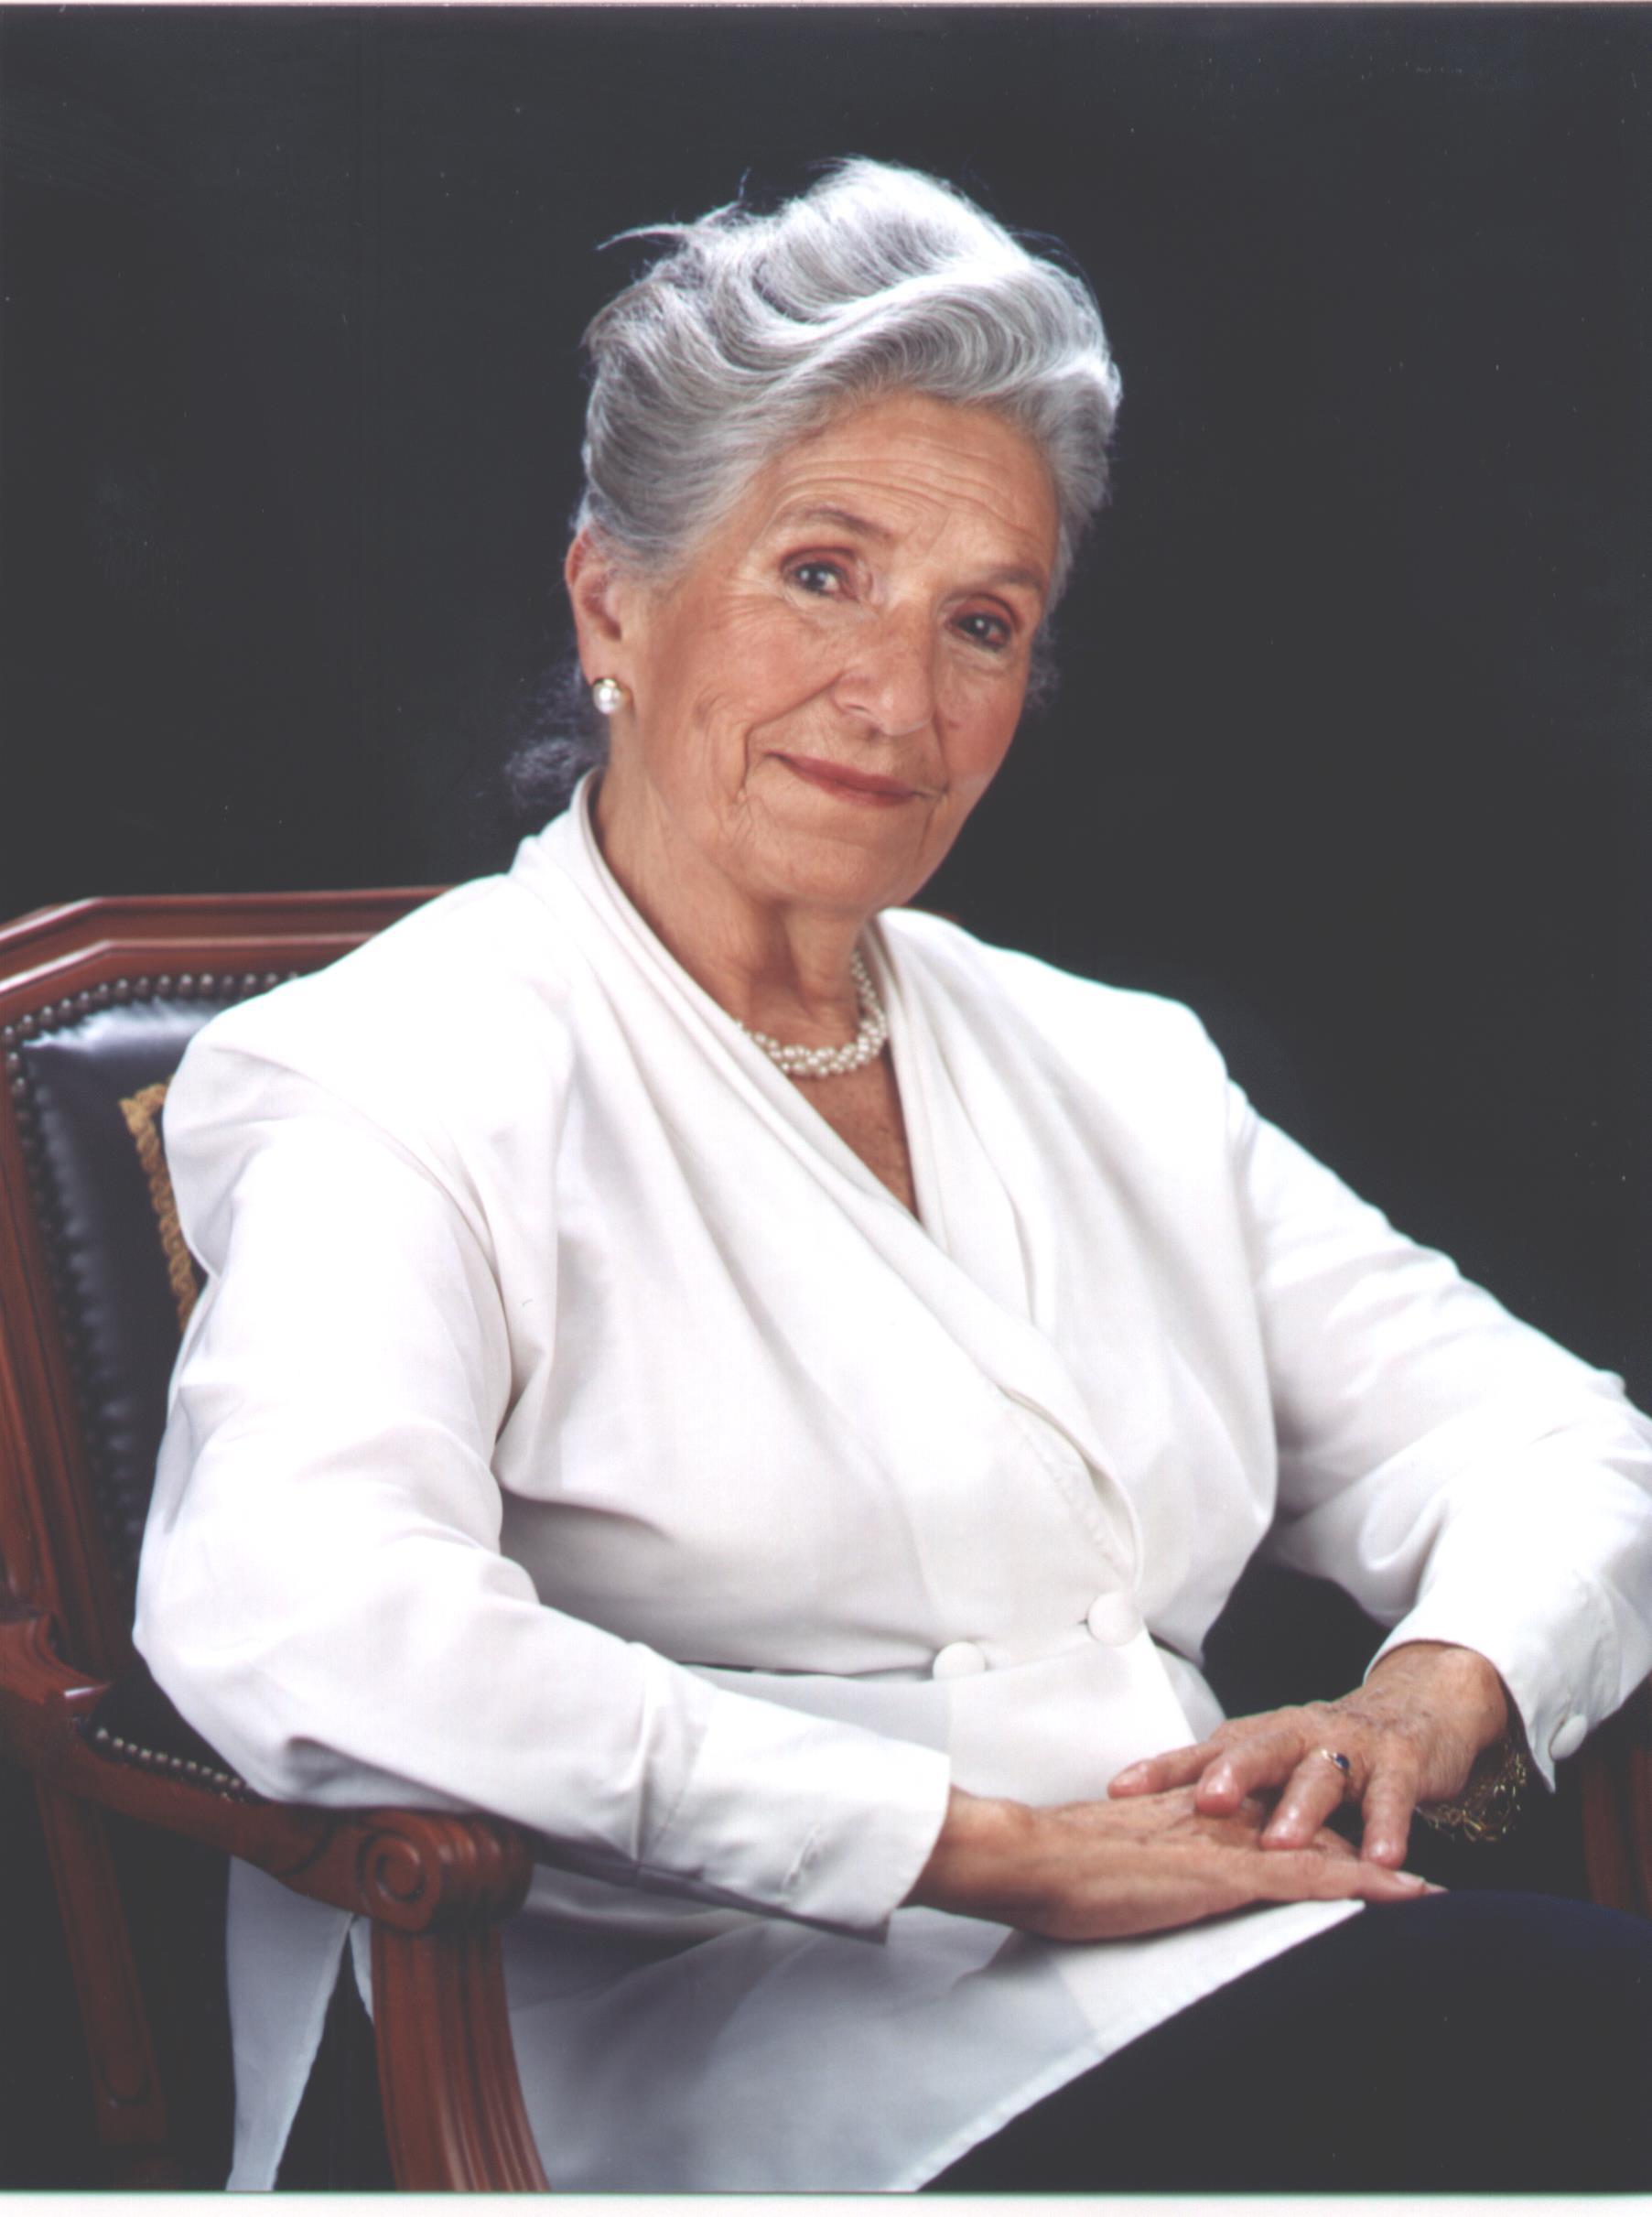 Sra. Josi Llorens Martí